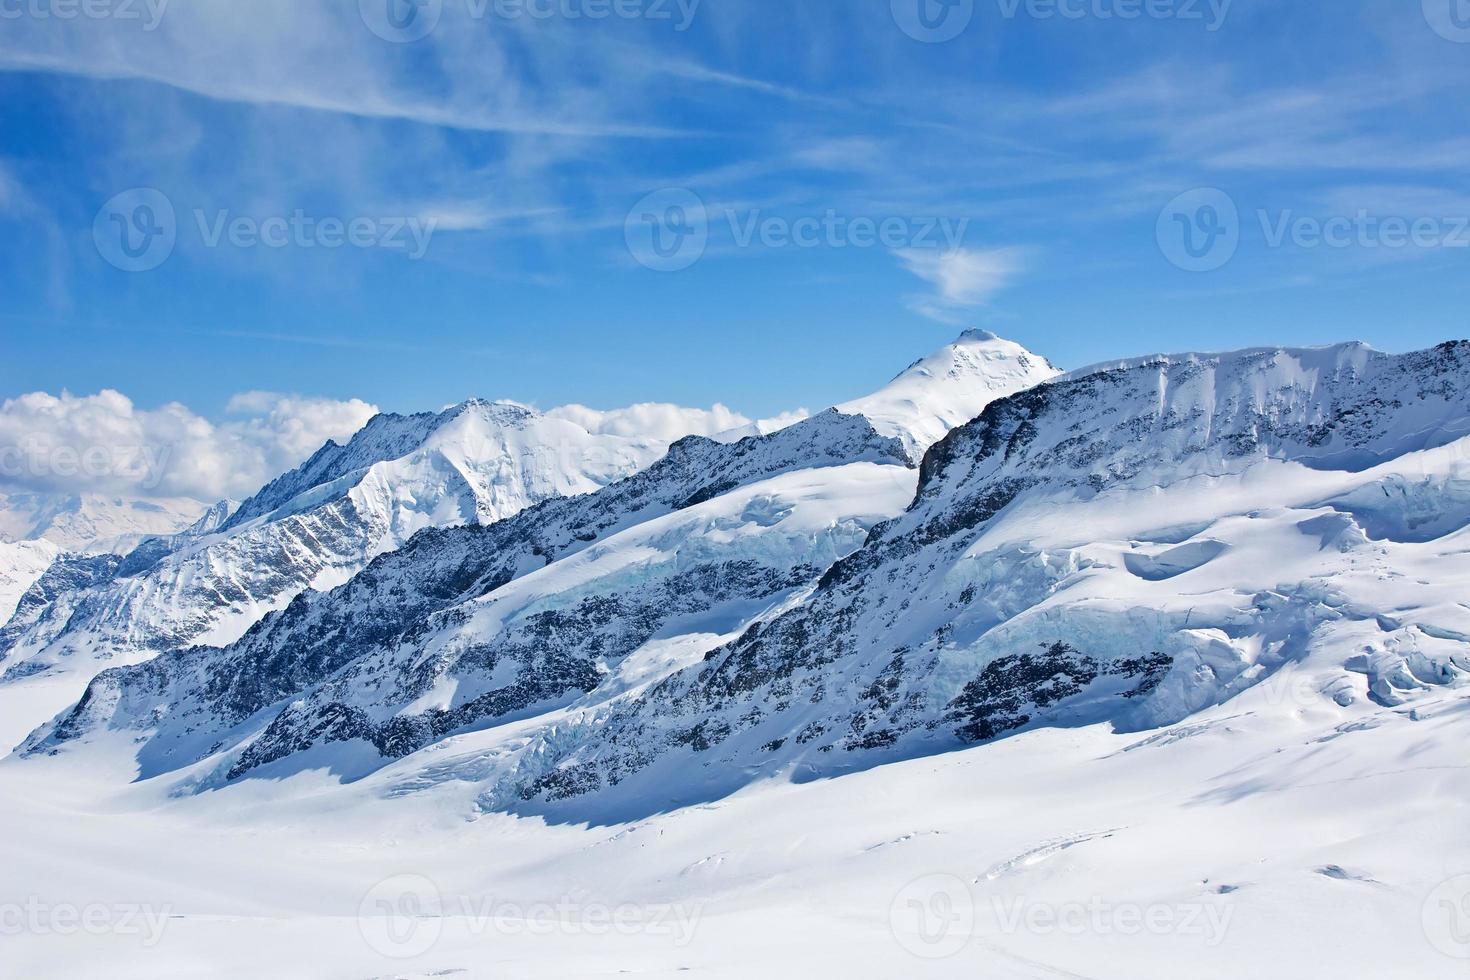 regione della jungfrau foto